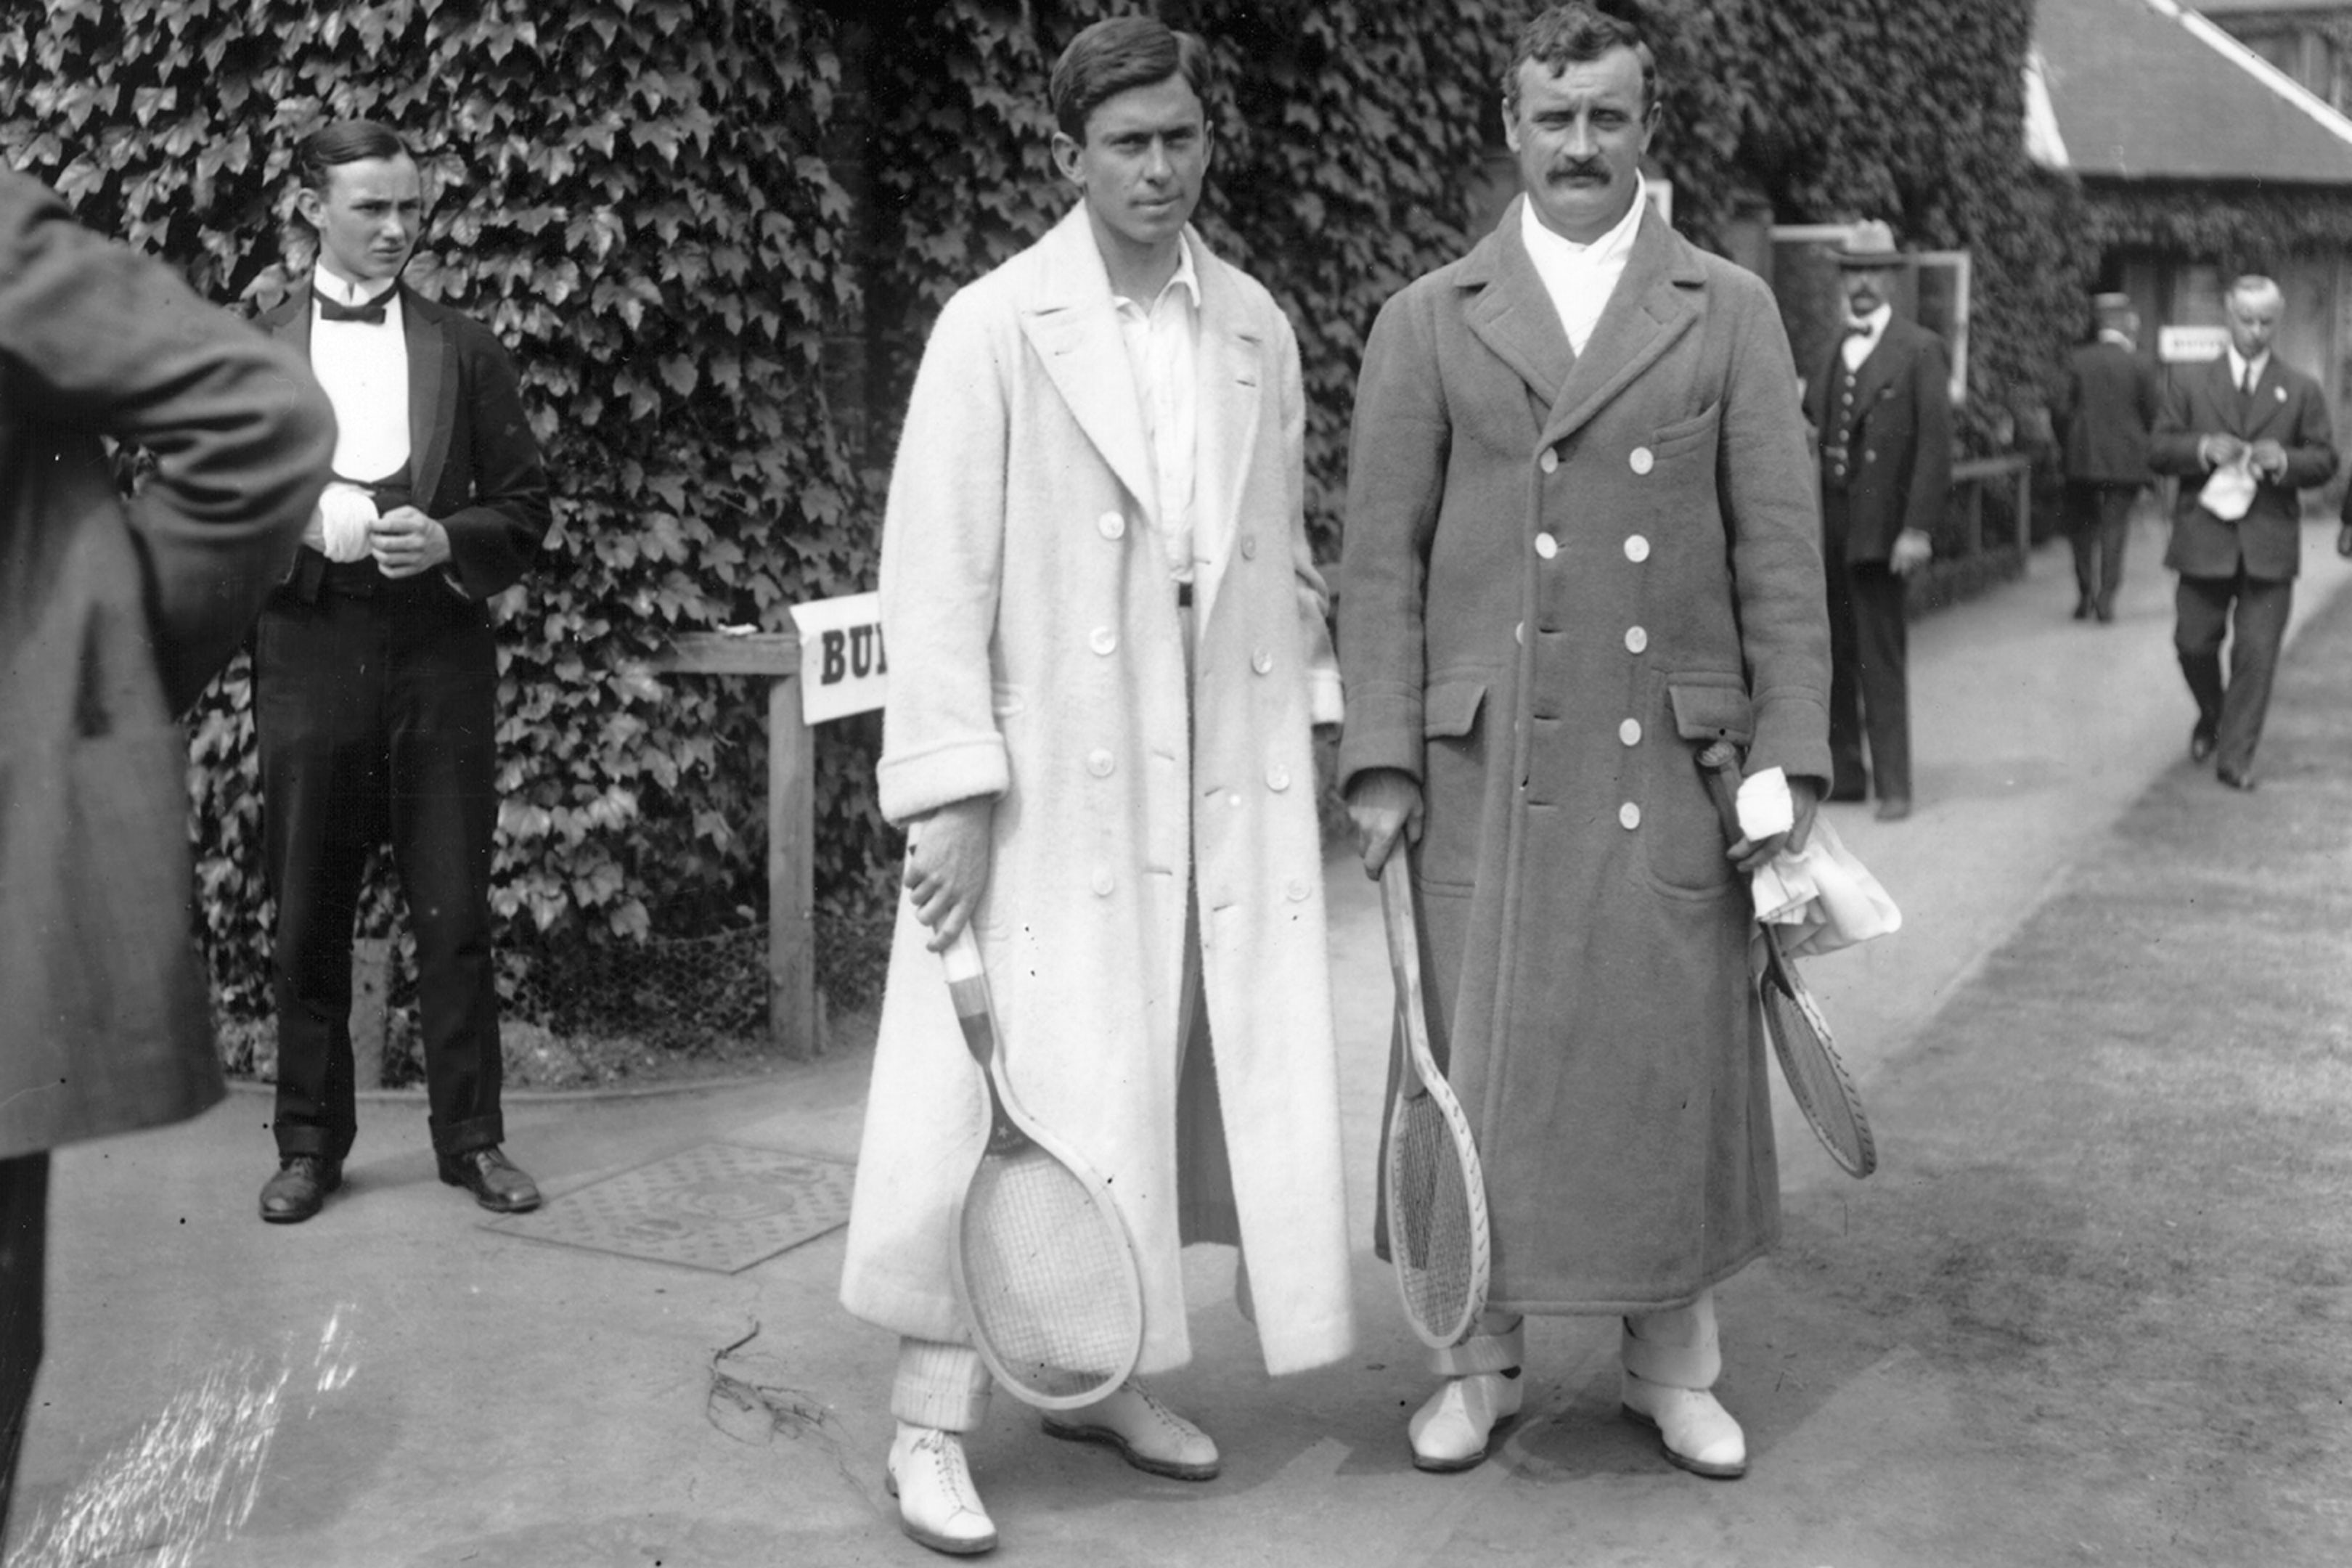 wimbledon fashion style tennis 1910